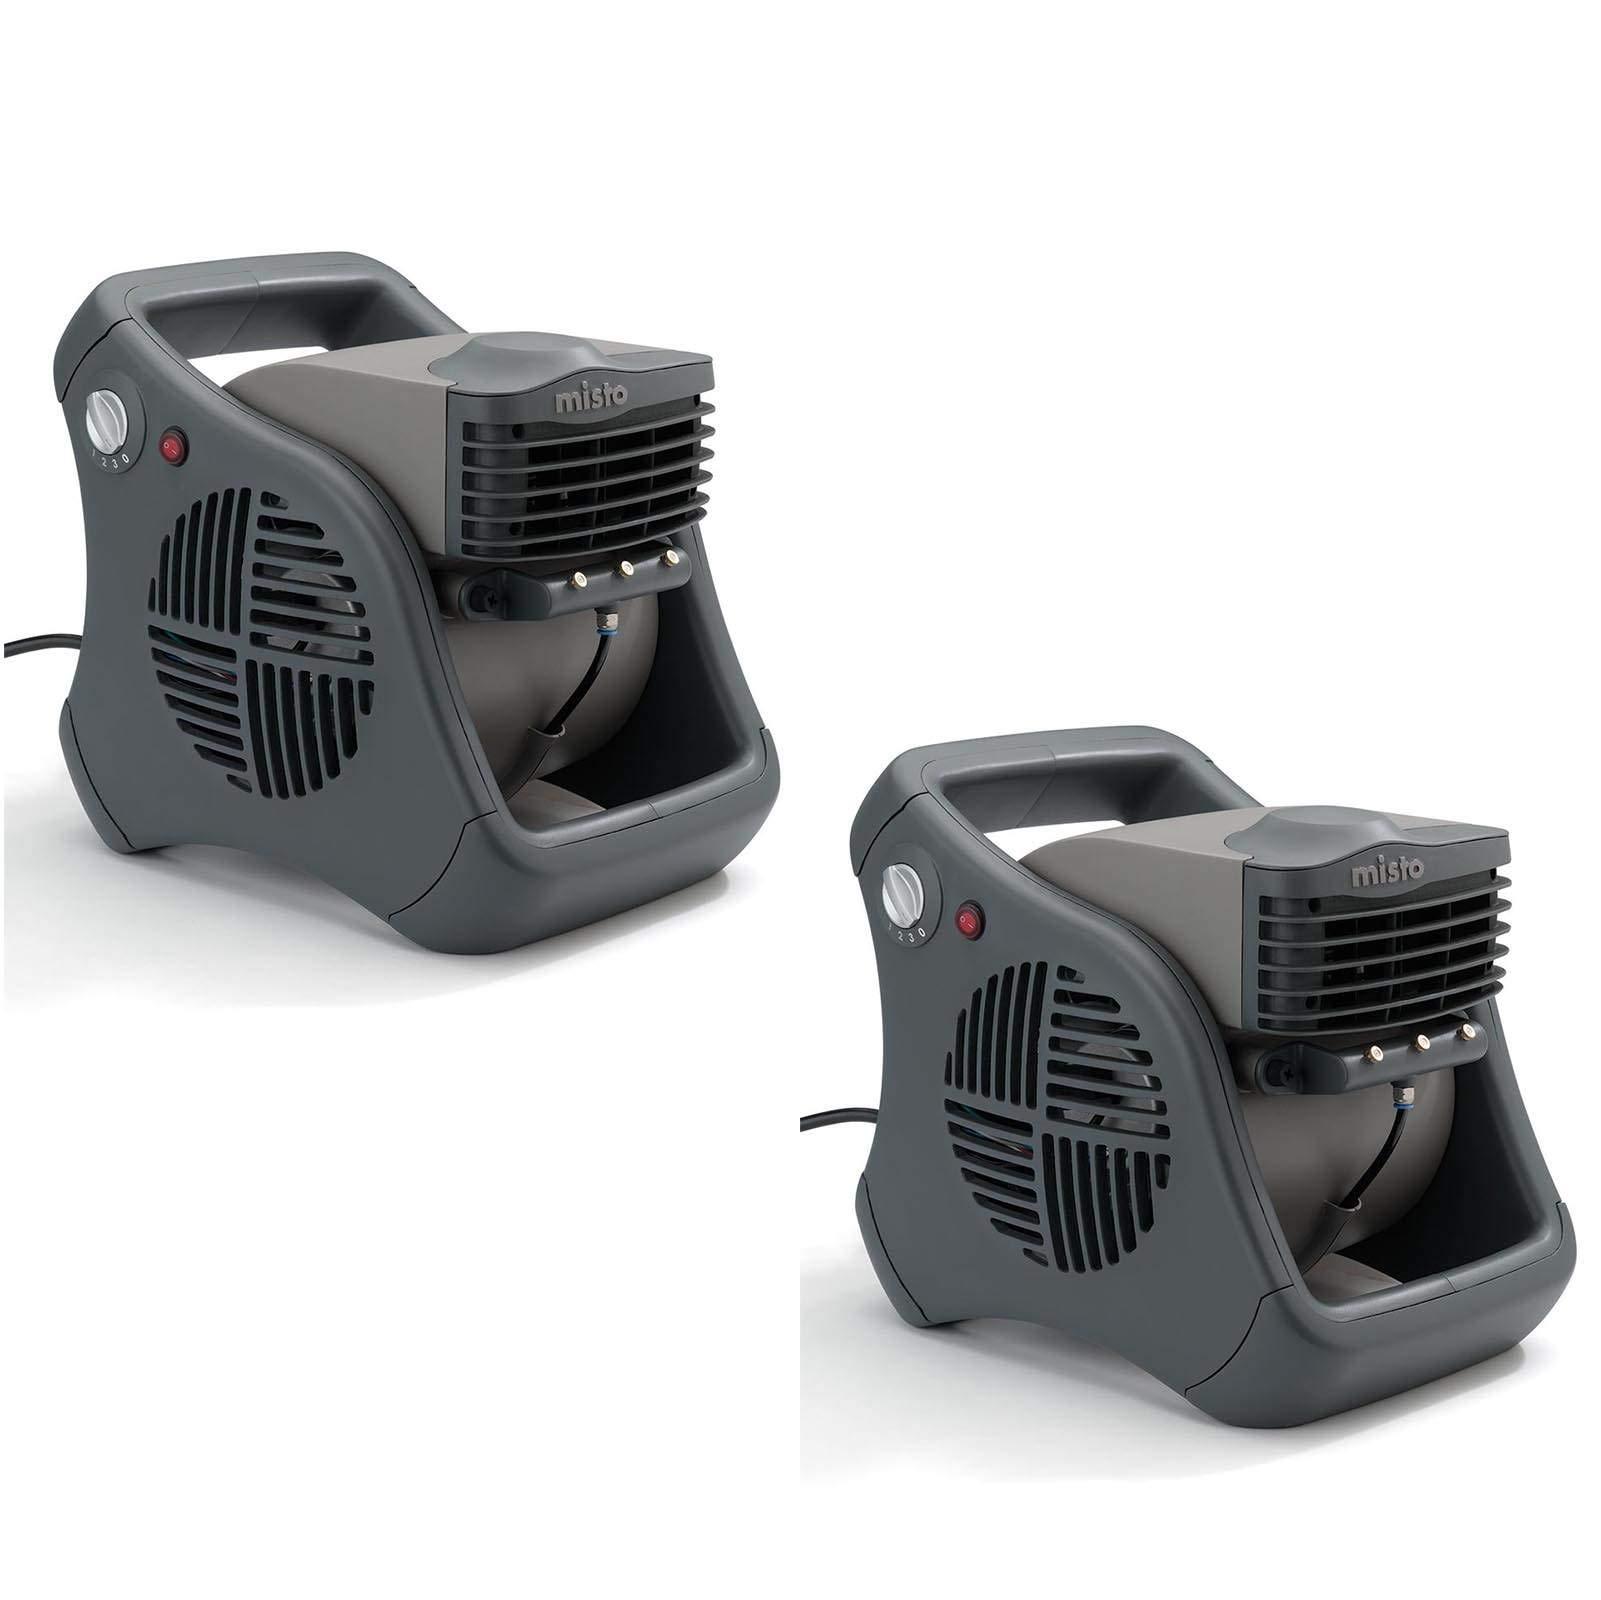 Lasko Misto Outdoor Patio Mister Portable Cooling Water Misting Fan (2 Pack) by Lasko